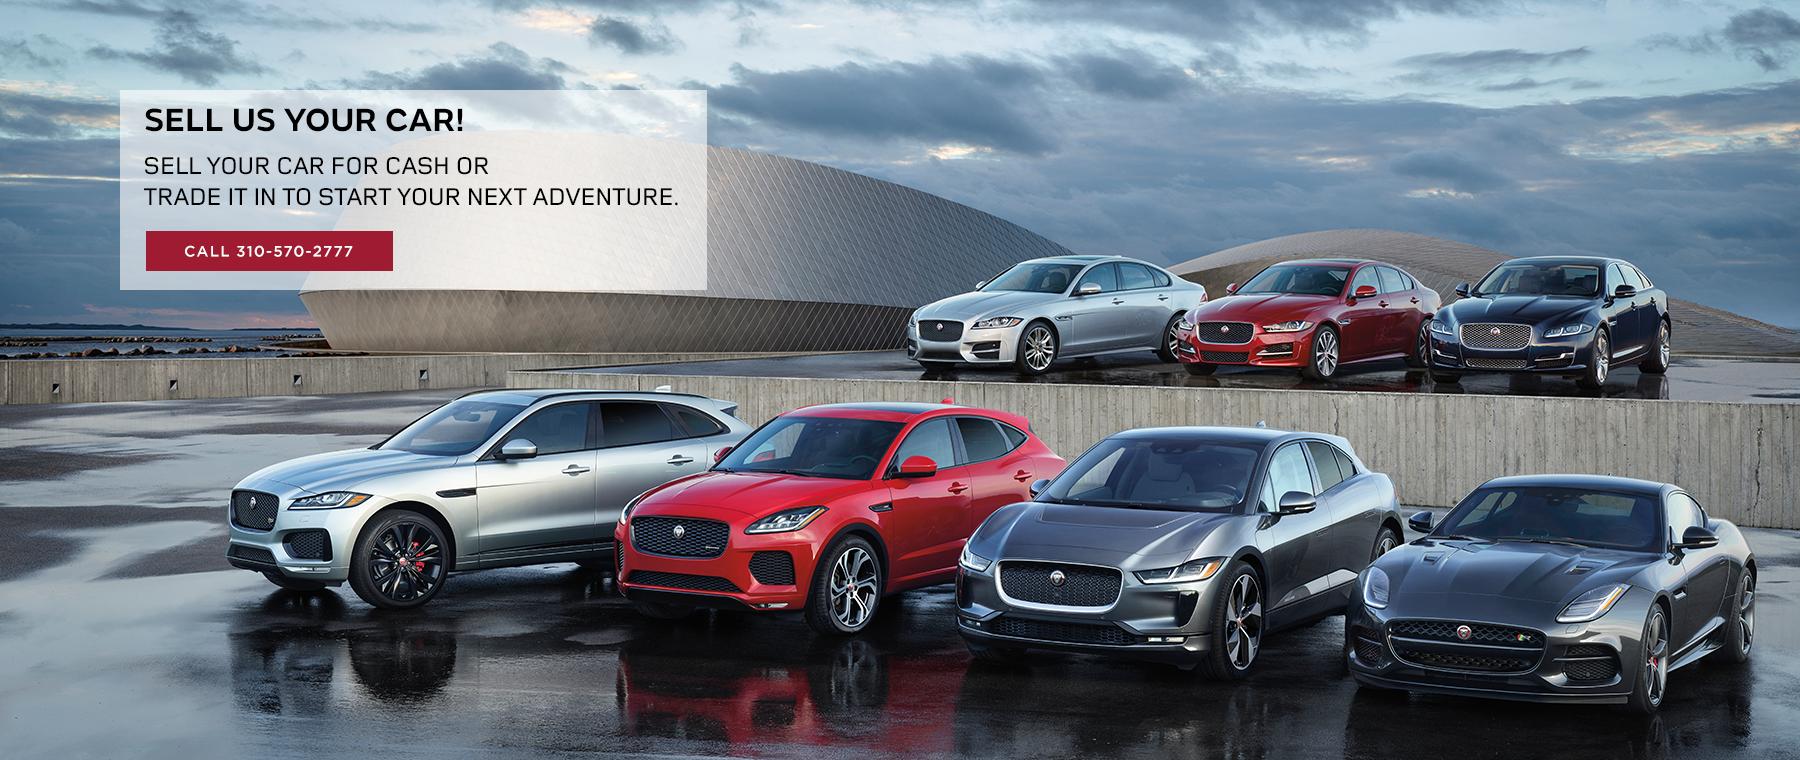 jaguar sell car